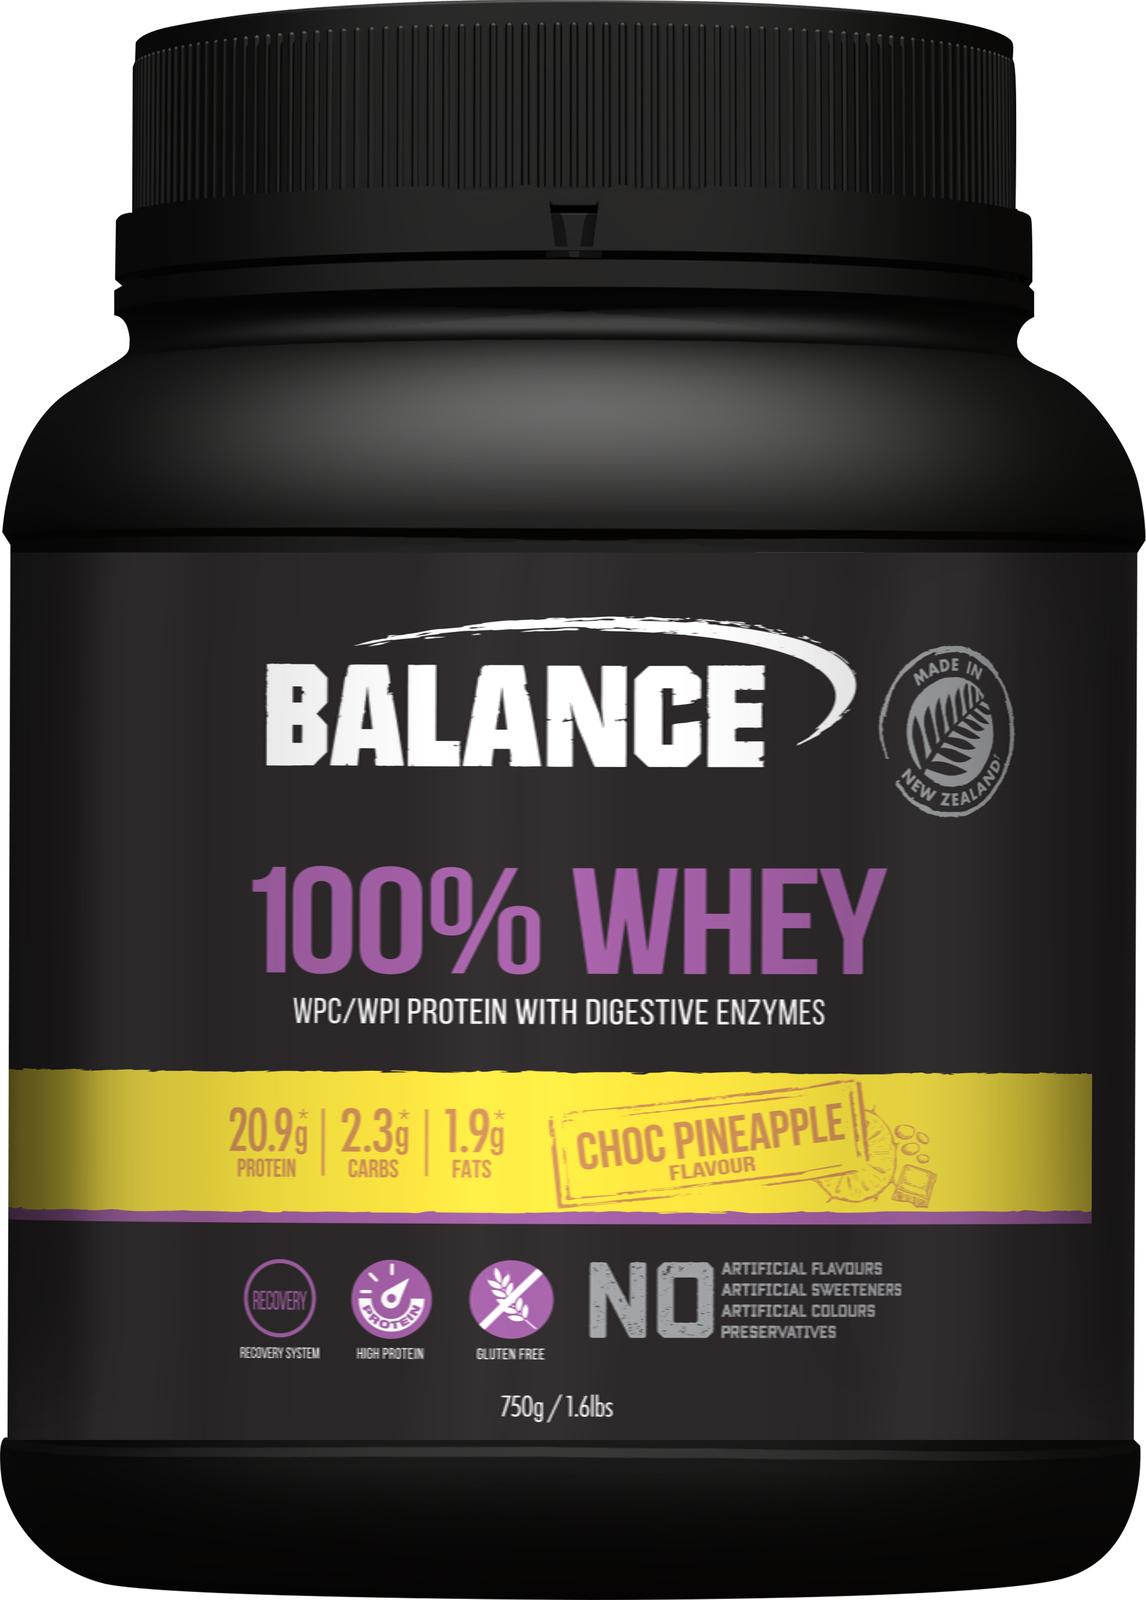 Balance 100% Whey - Choc Pineapple (750g) image